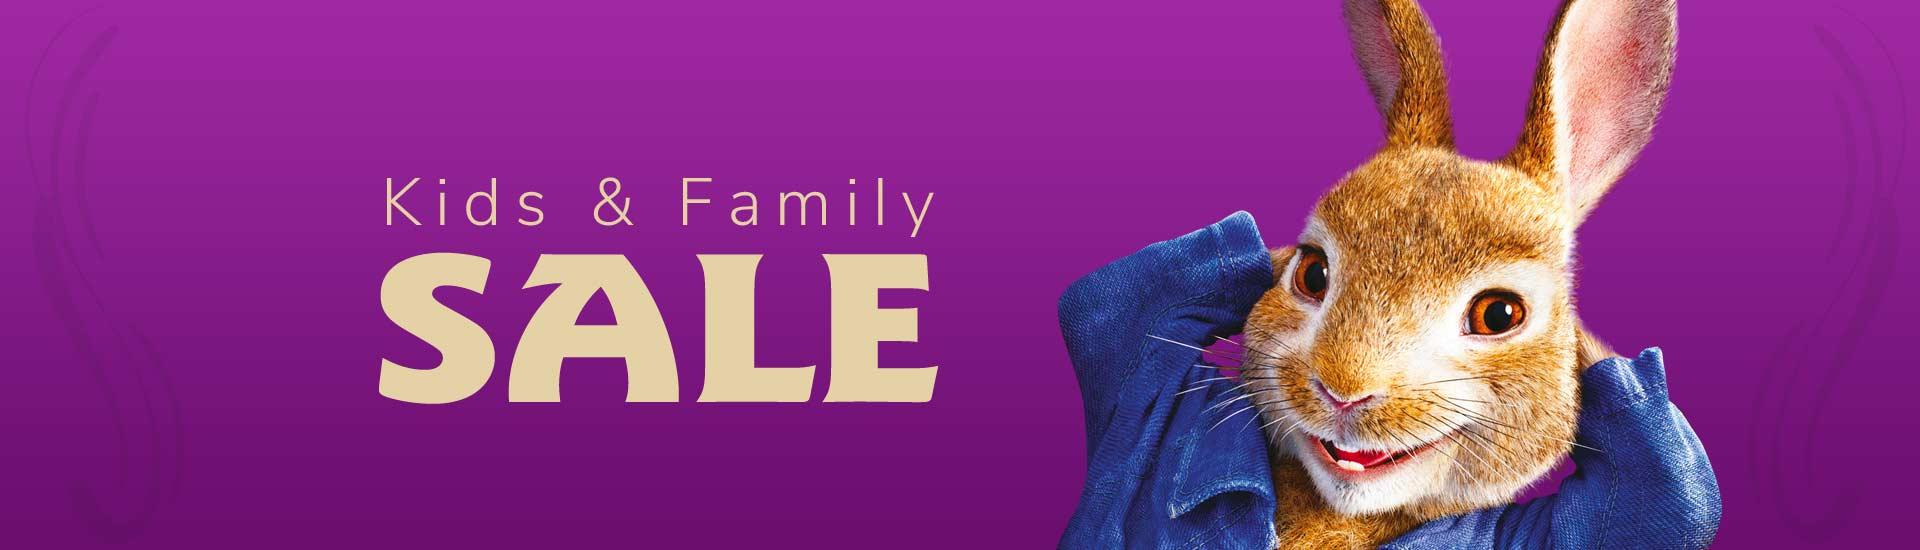 Kids & Family Sale